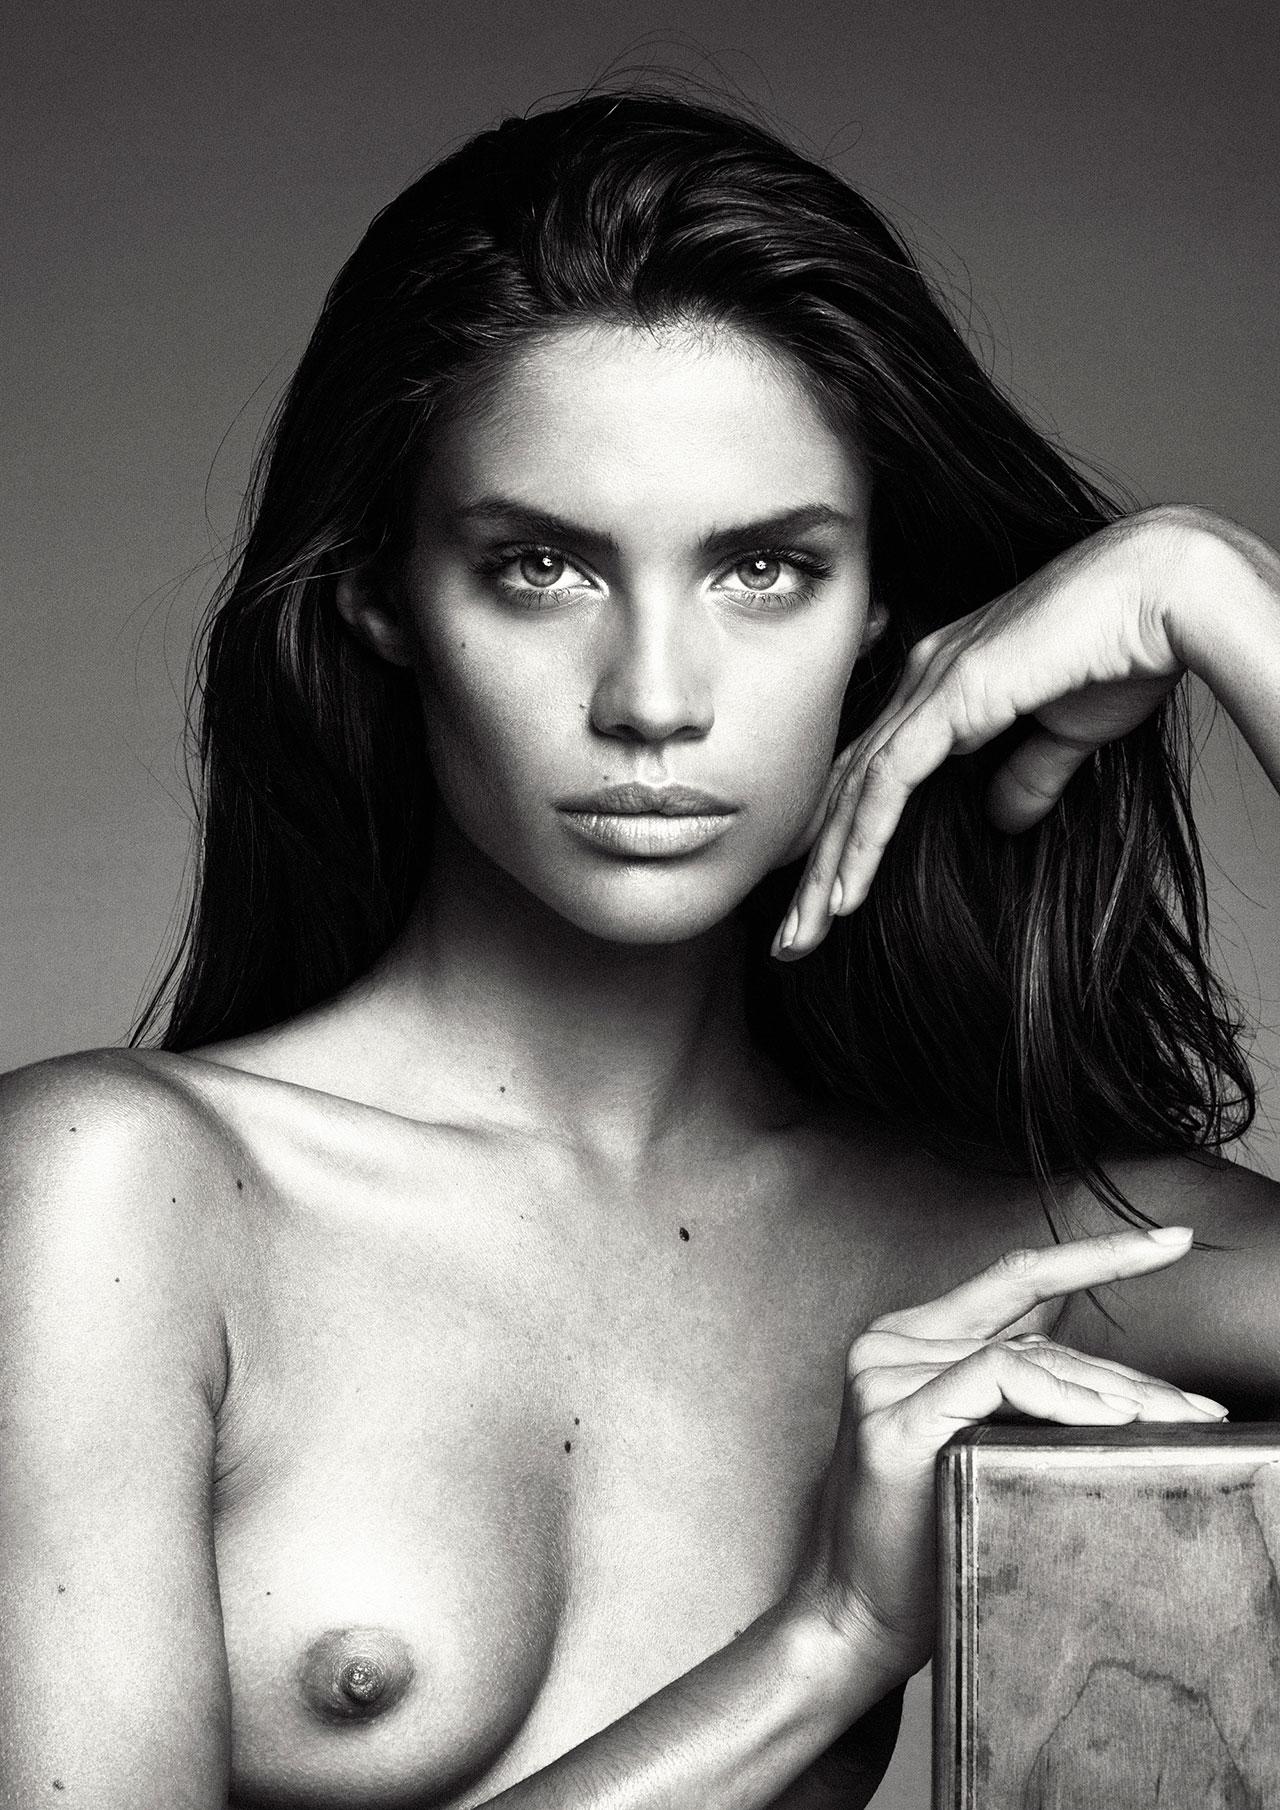 sarah canning naked pics